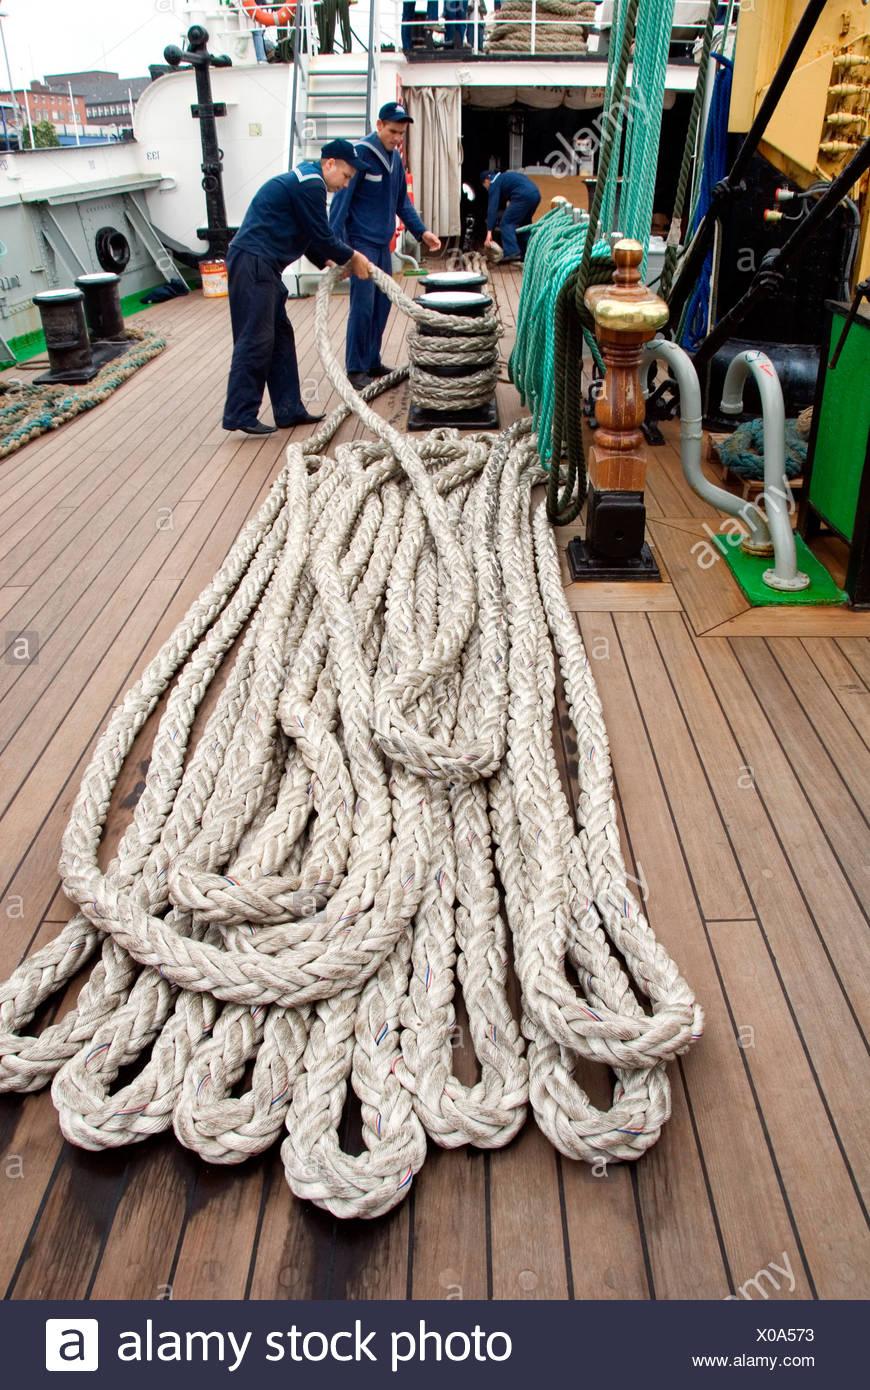 seamen and ropes on deck of the Kruzenshtern, Krusenstern, Germany, Schleswig-Holstein, Kiel - Stock Image